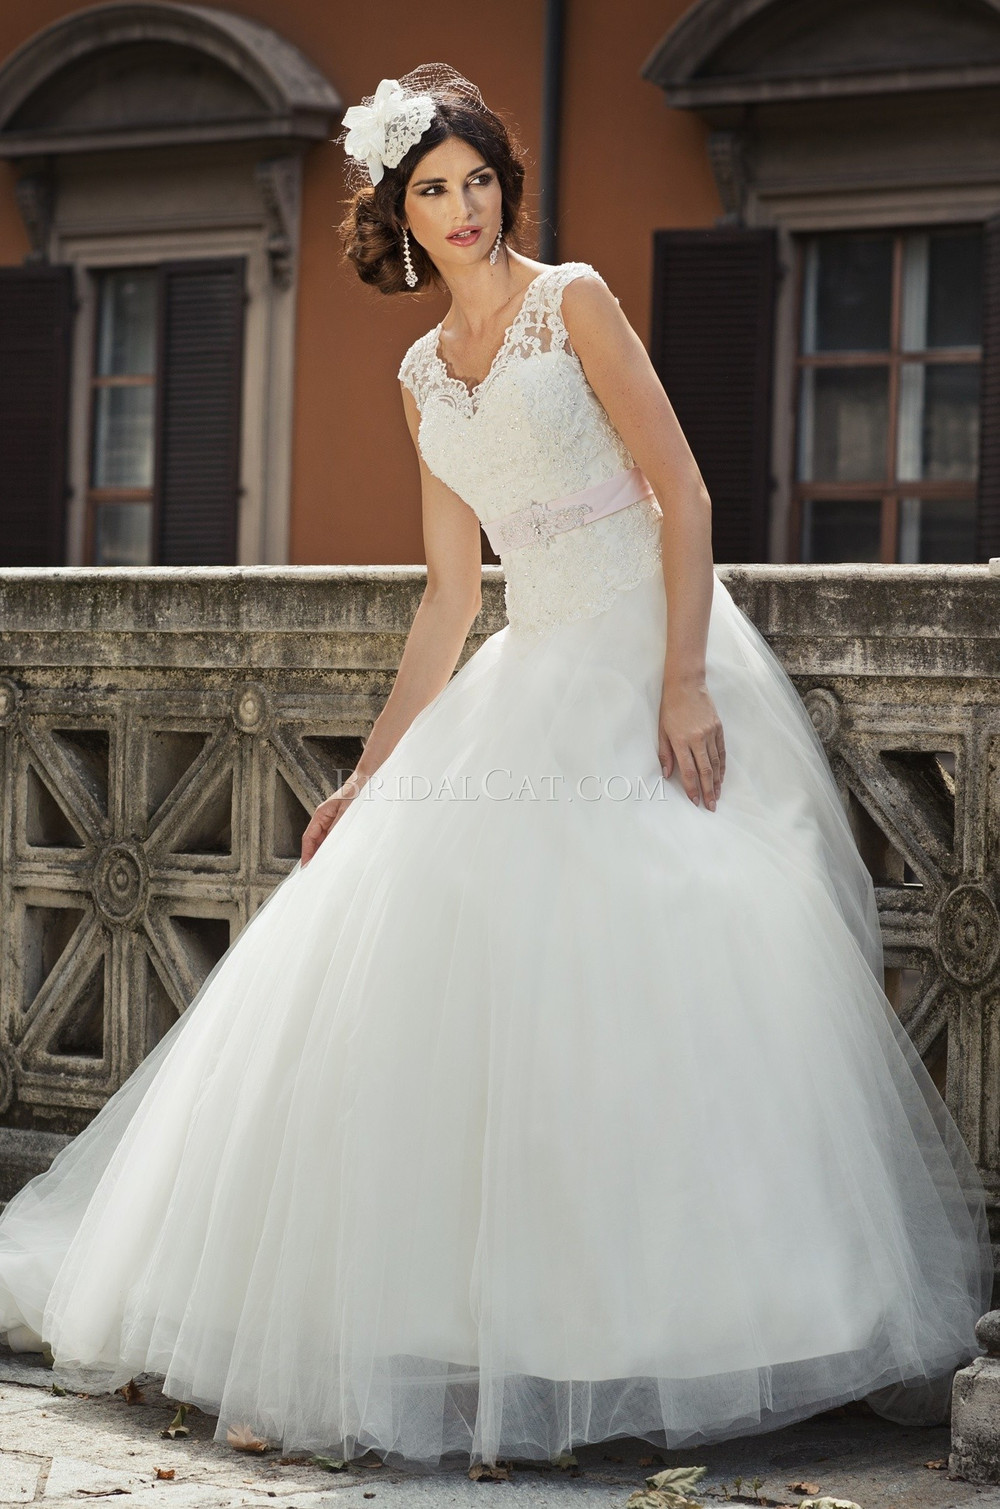 Vestido de novia de encaje victoriana